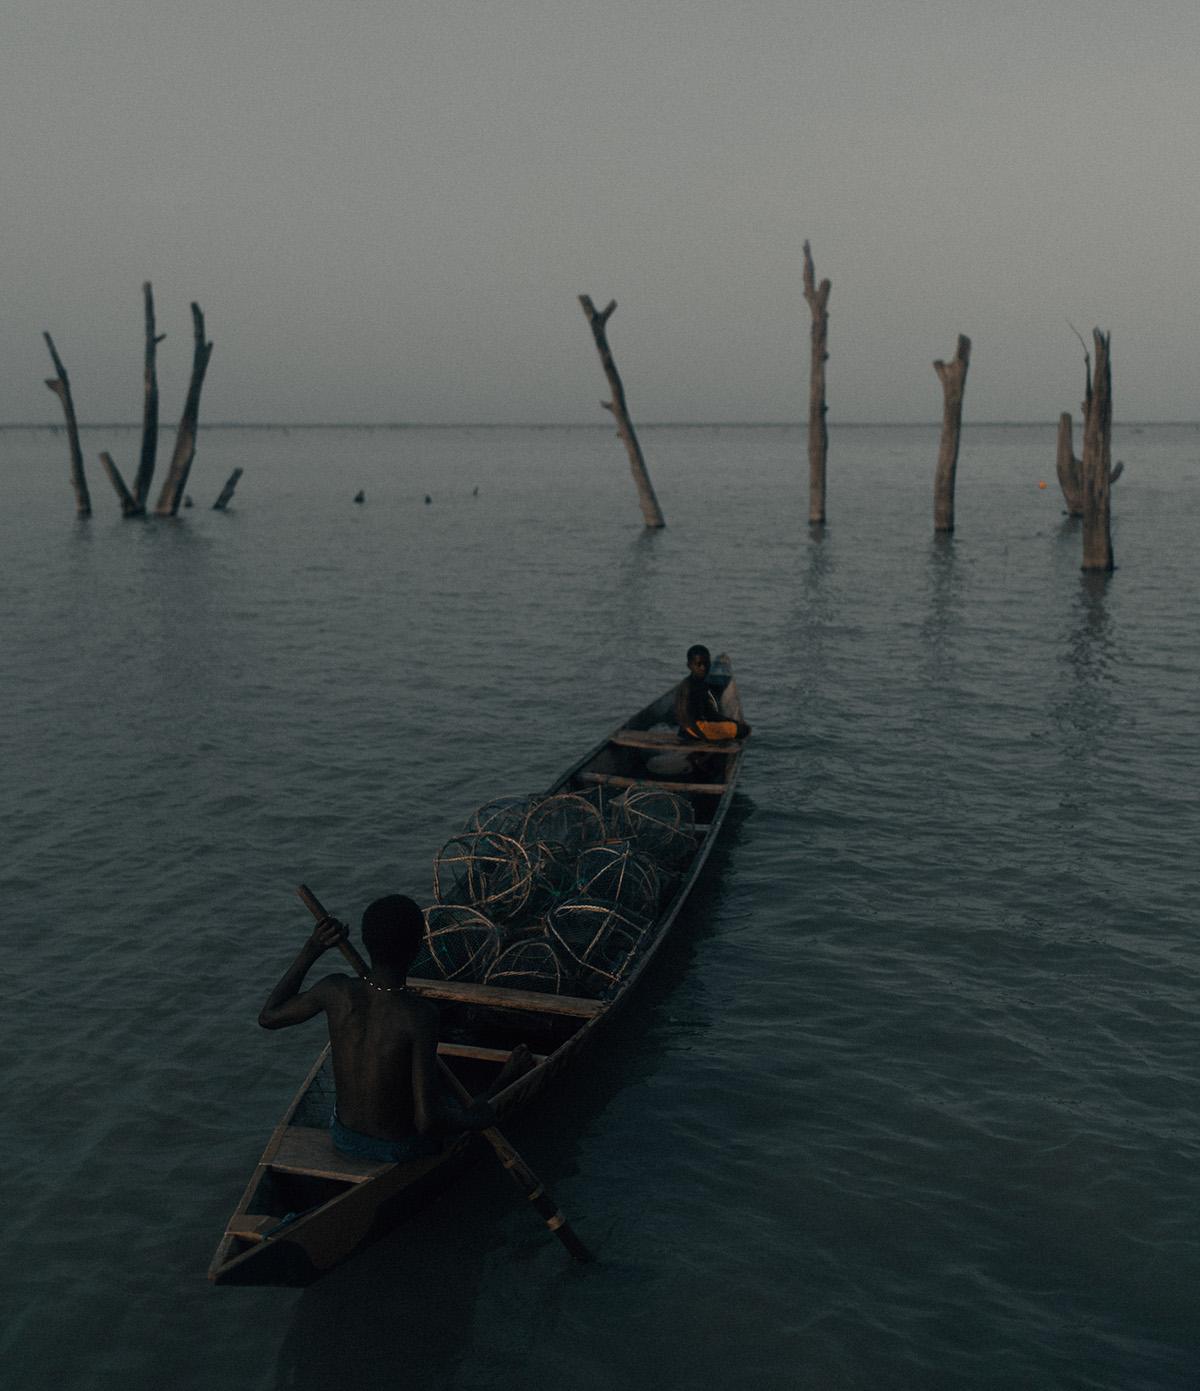 Boys of Volta Jeremy Snell Child Labor Fishing Child Trafficking